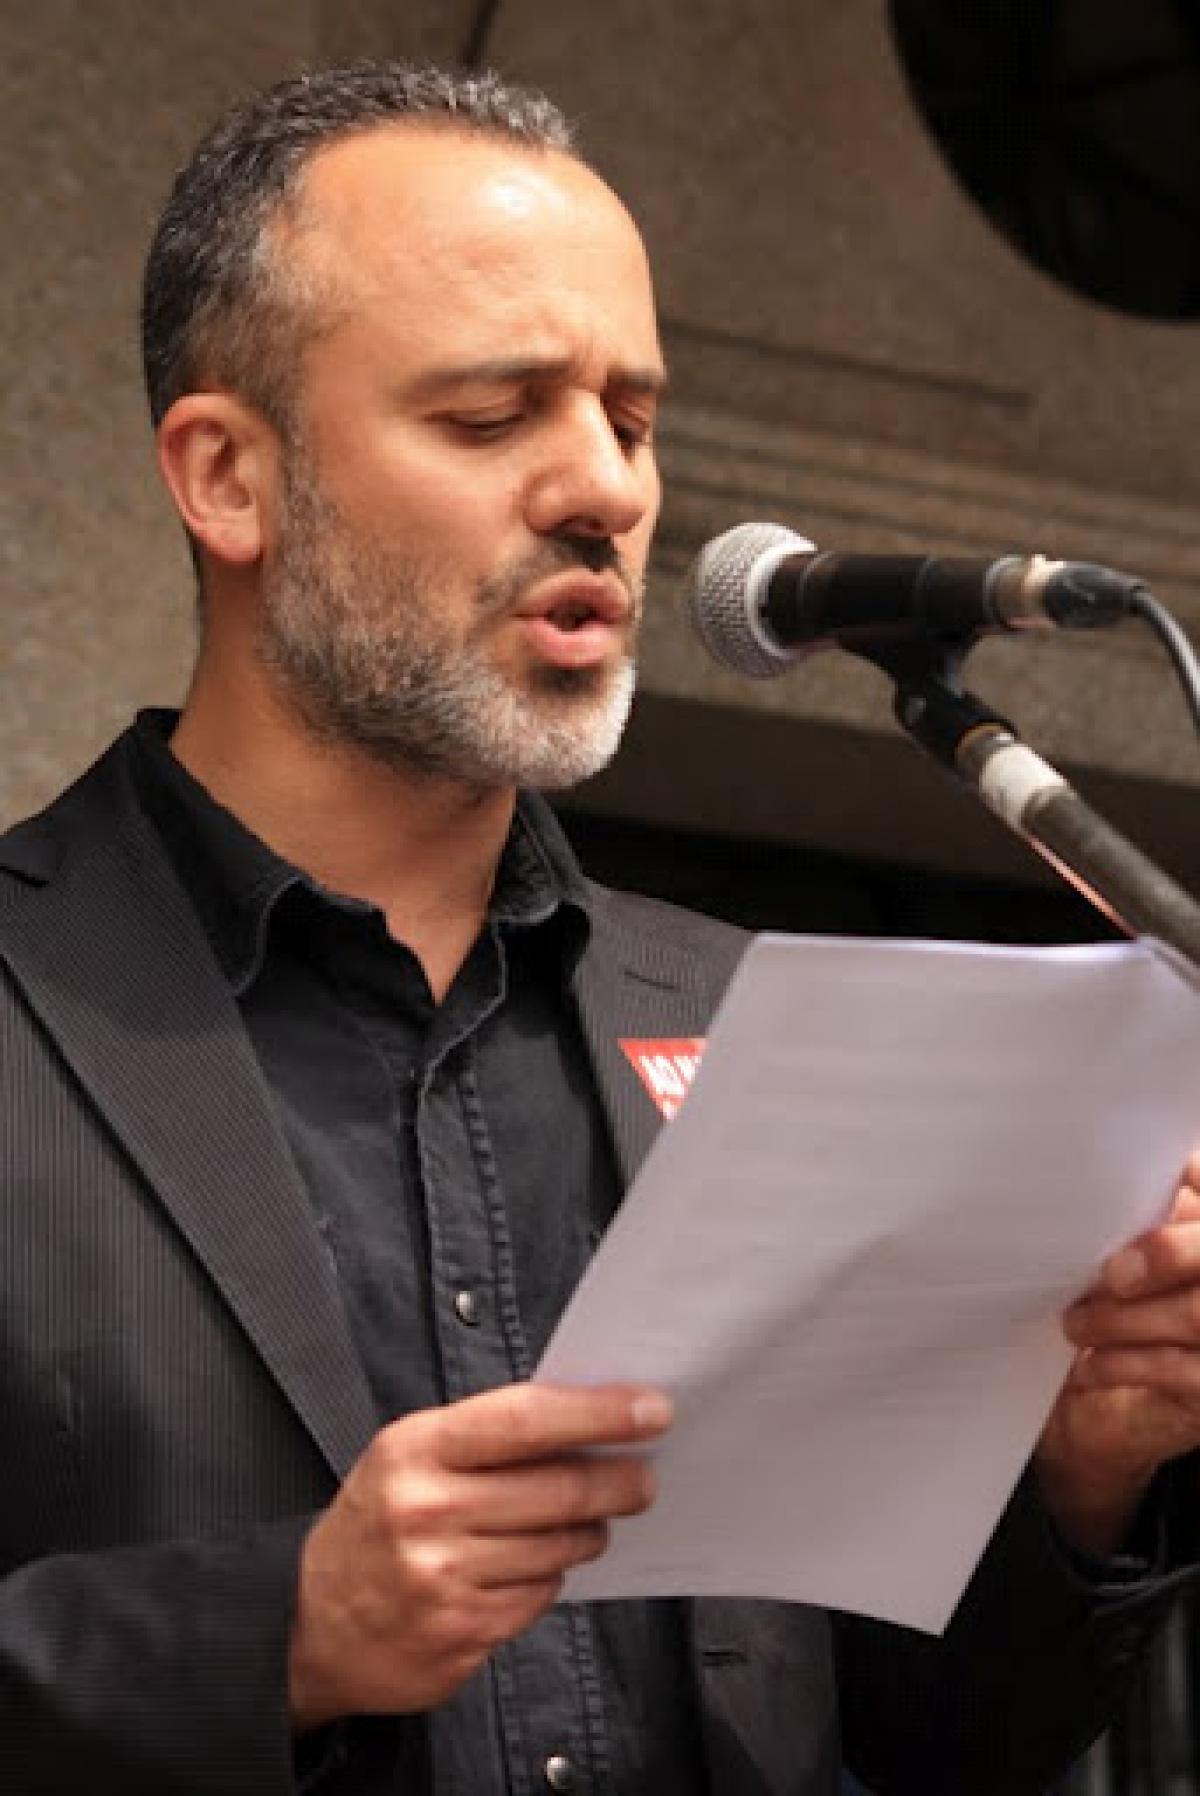 O actor Javier Gutiérrez le o manifesto